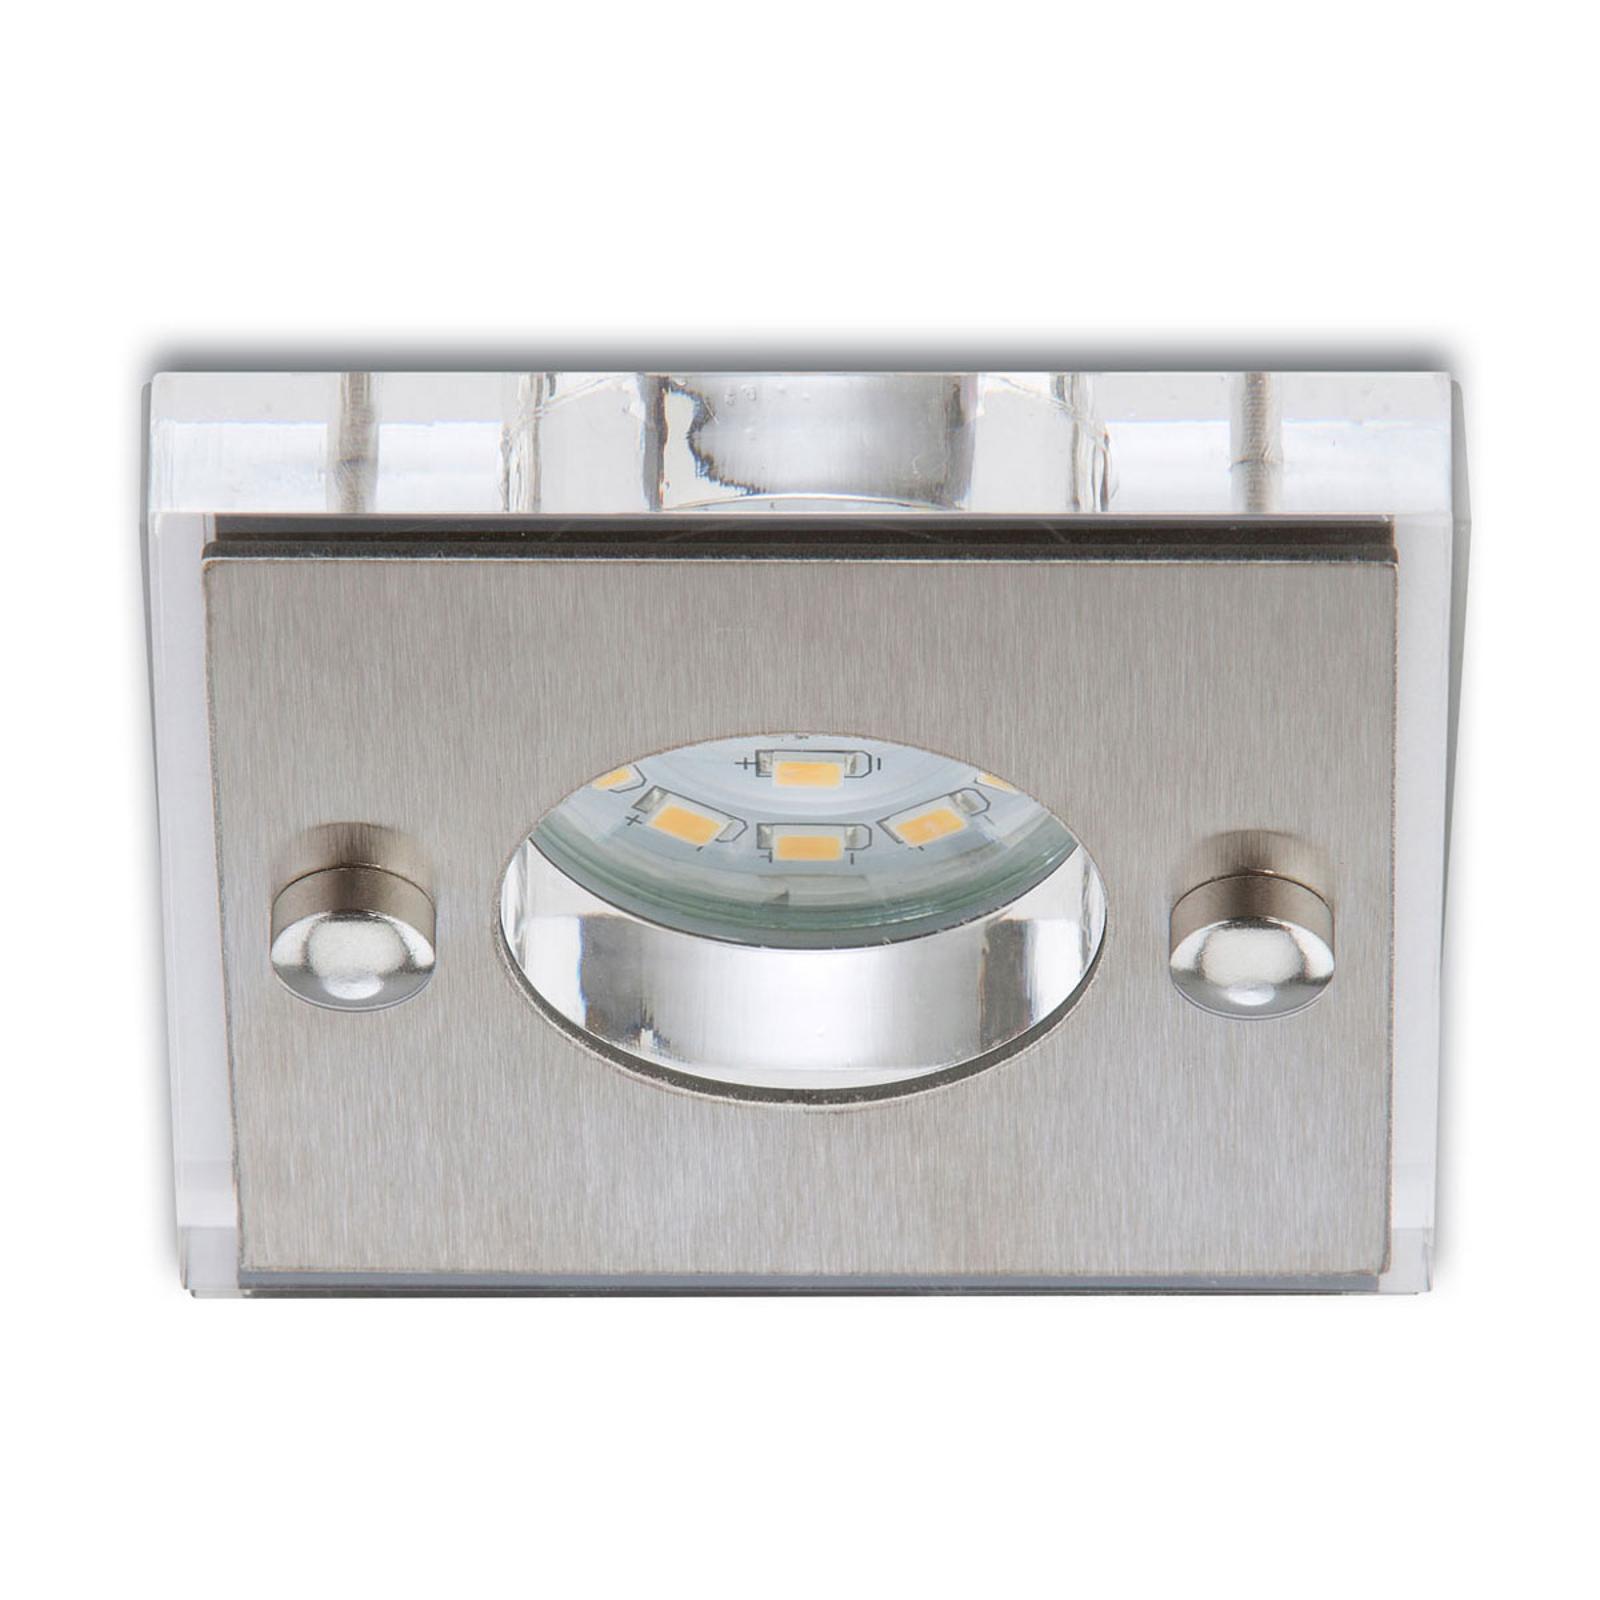 Foco empotrado LED cuadrado Nikas aluminio